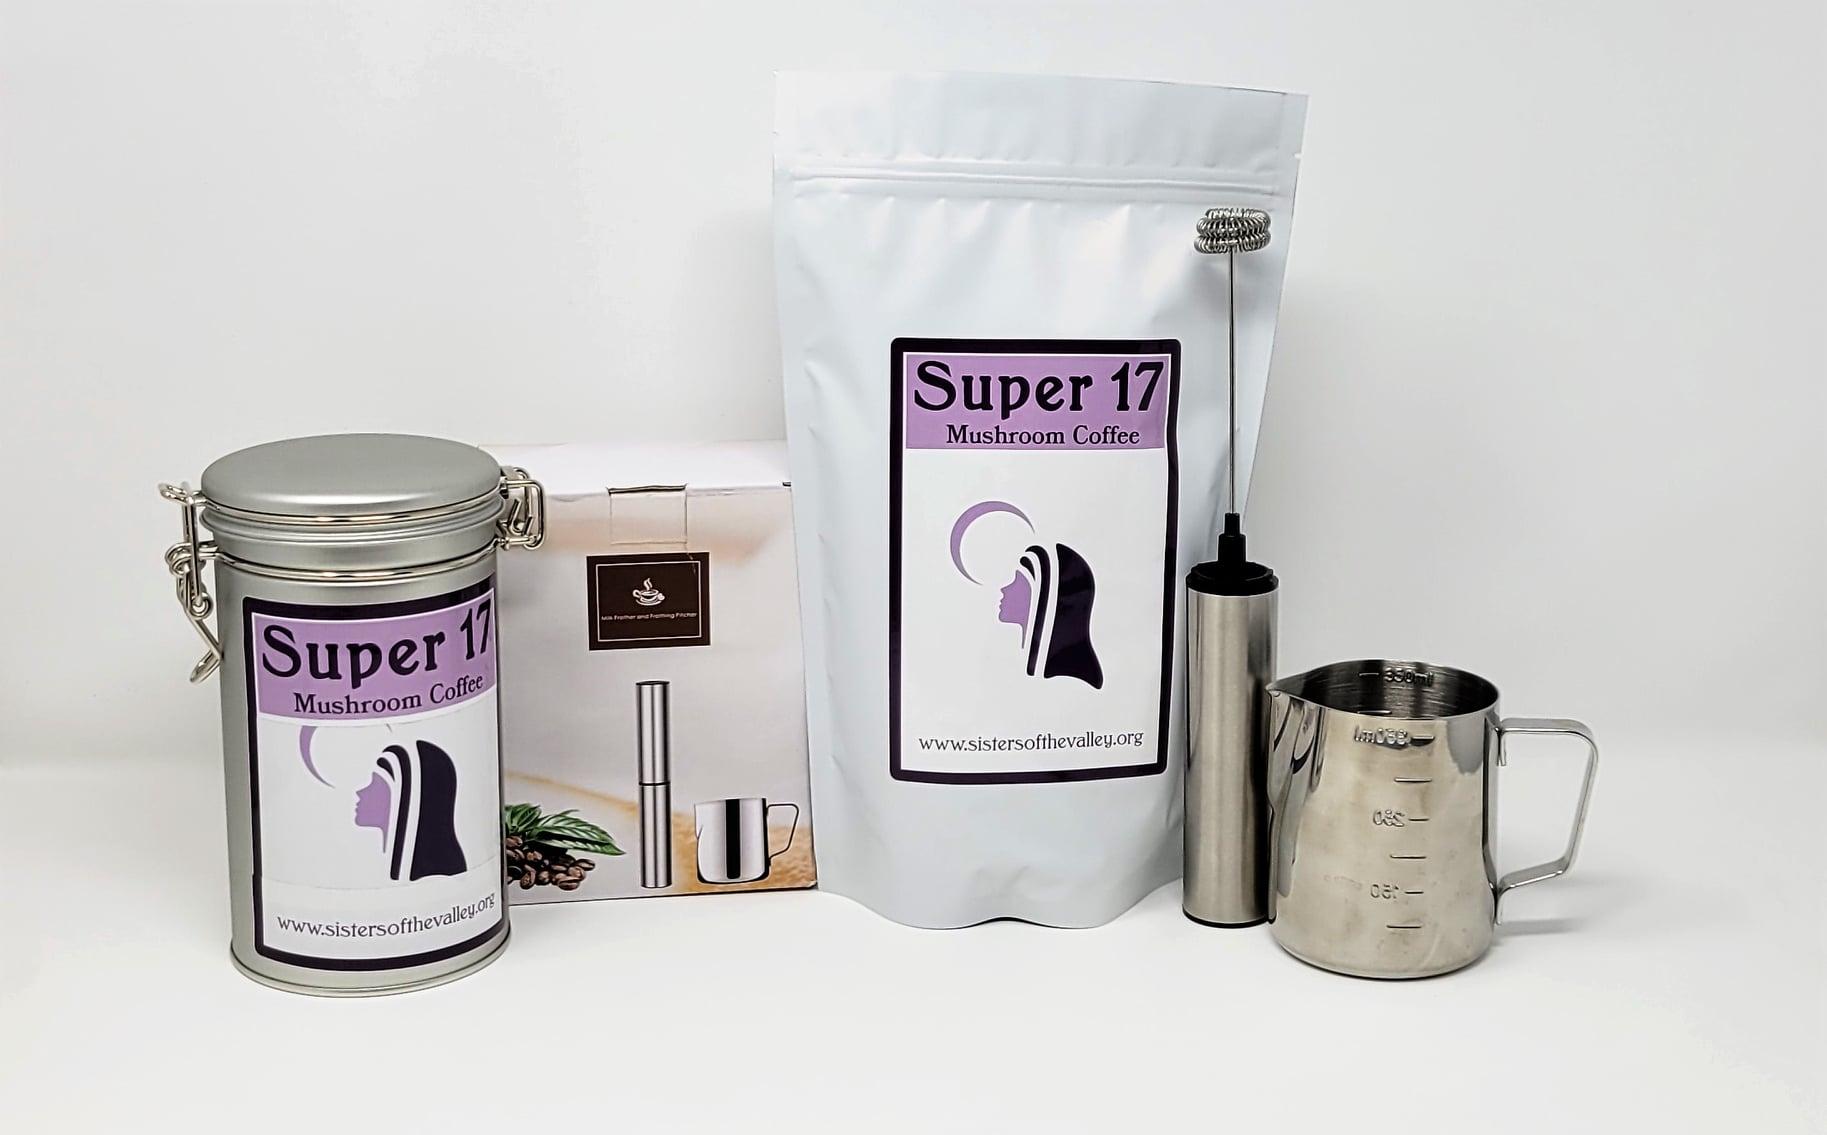 Sisters-of-the-Valley-mushroom-coffee